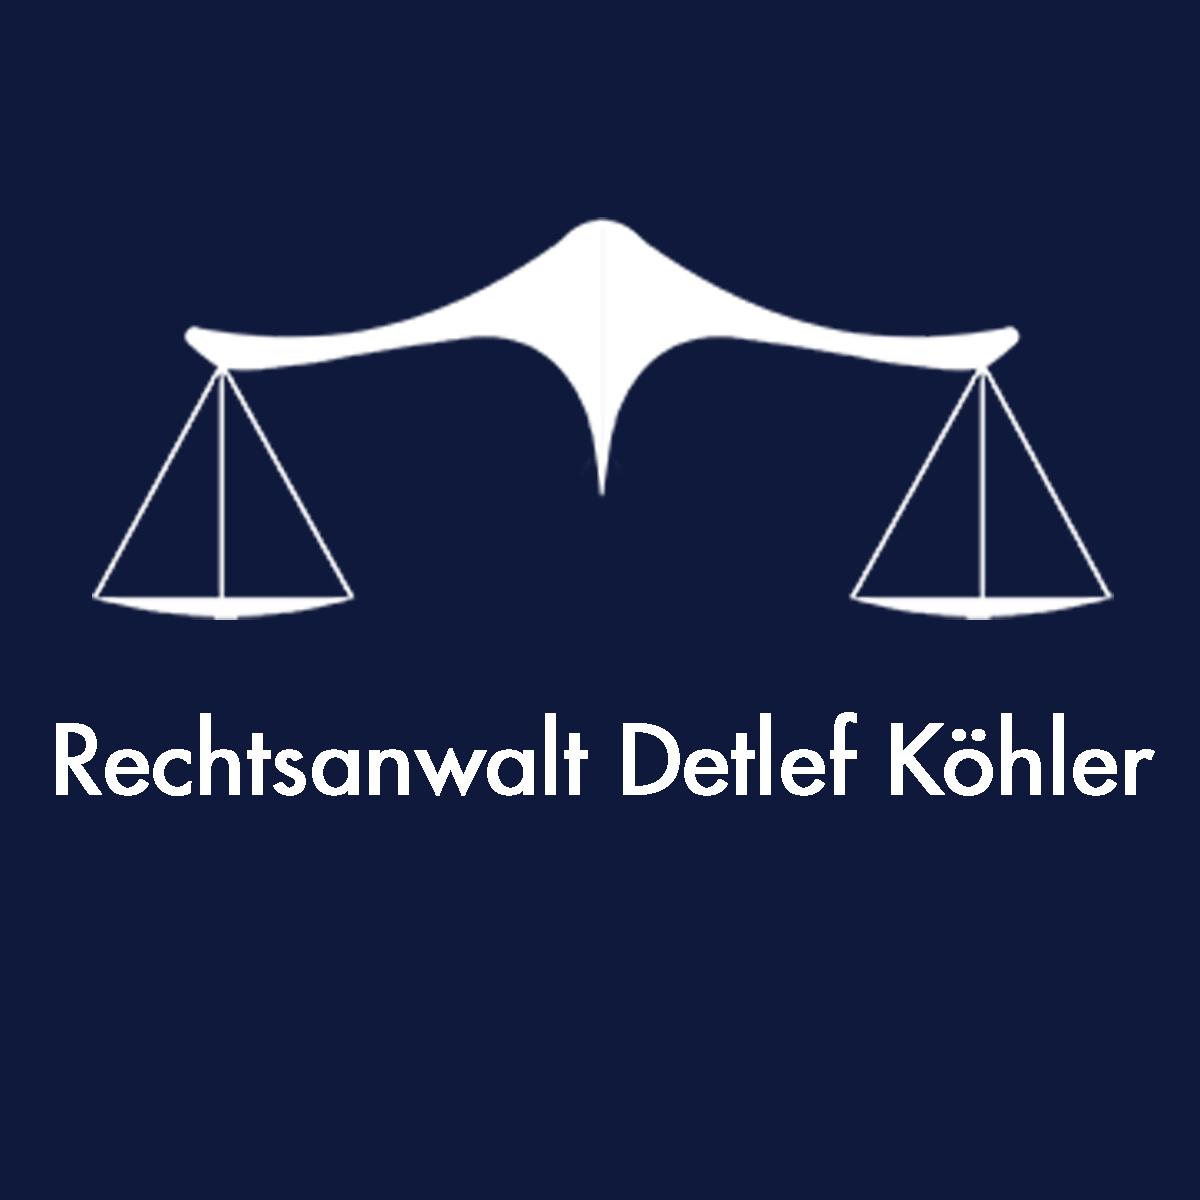 Rechtsanwalt Detlef Köhler